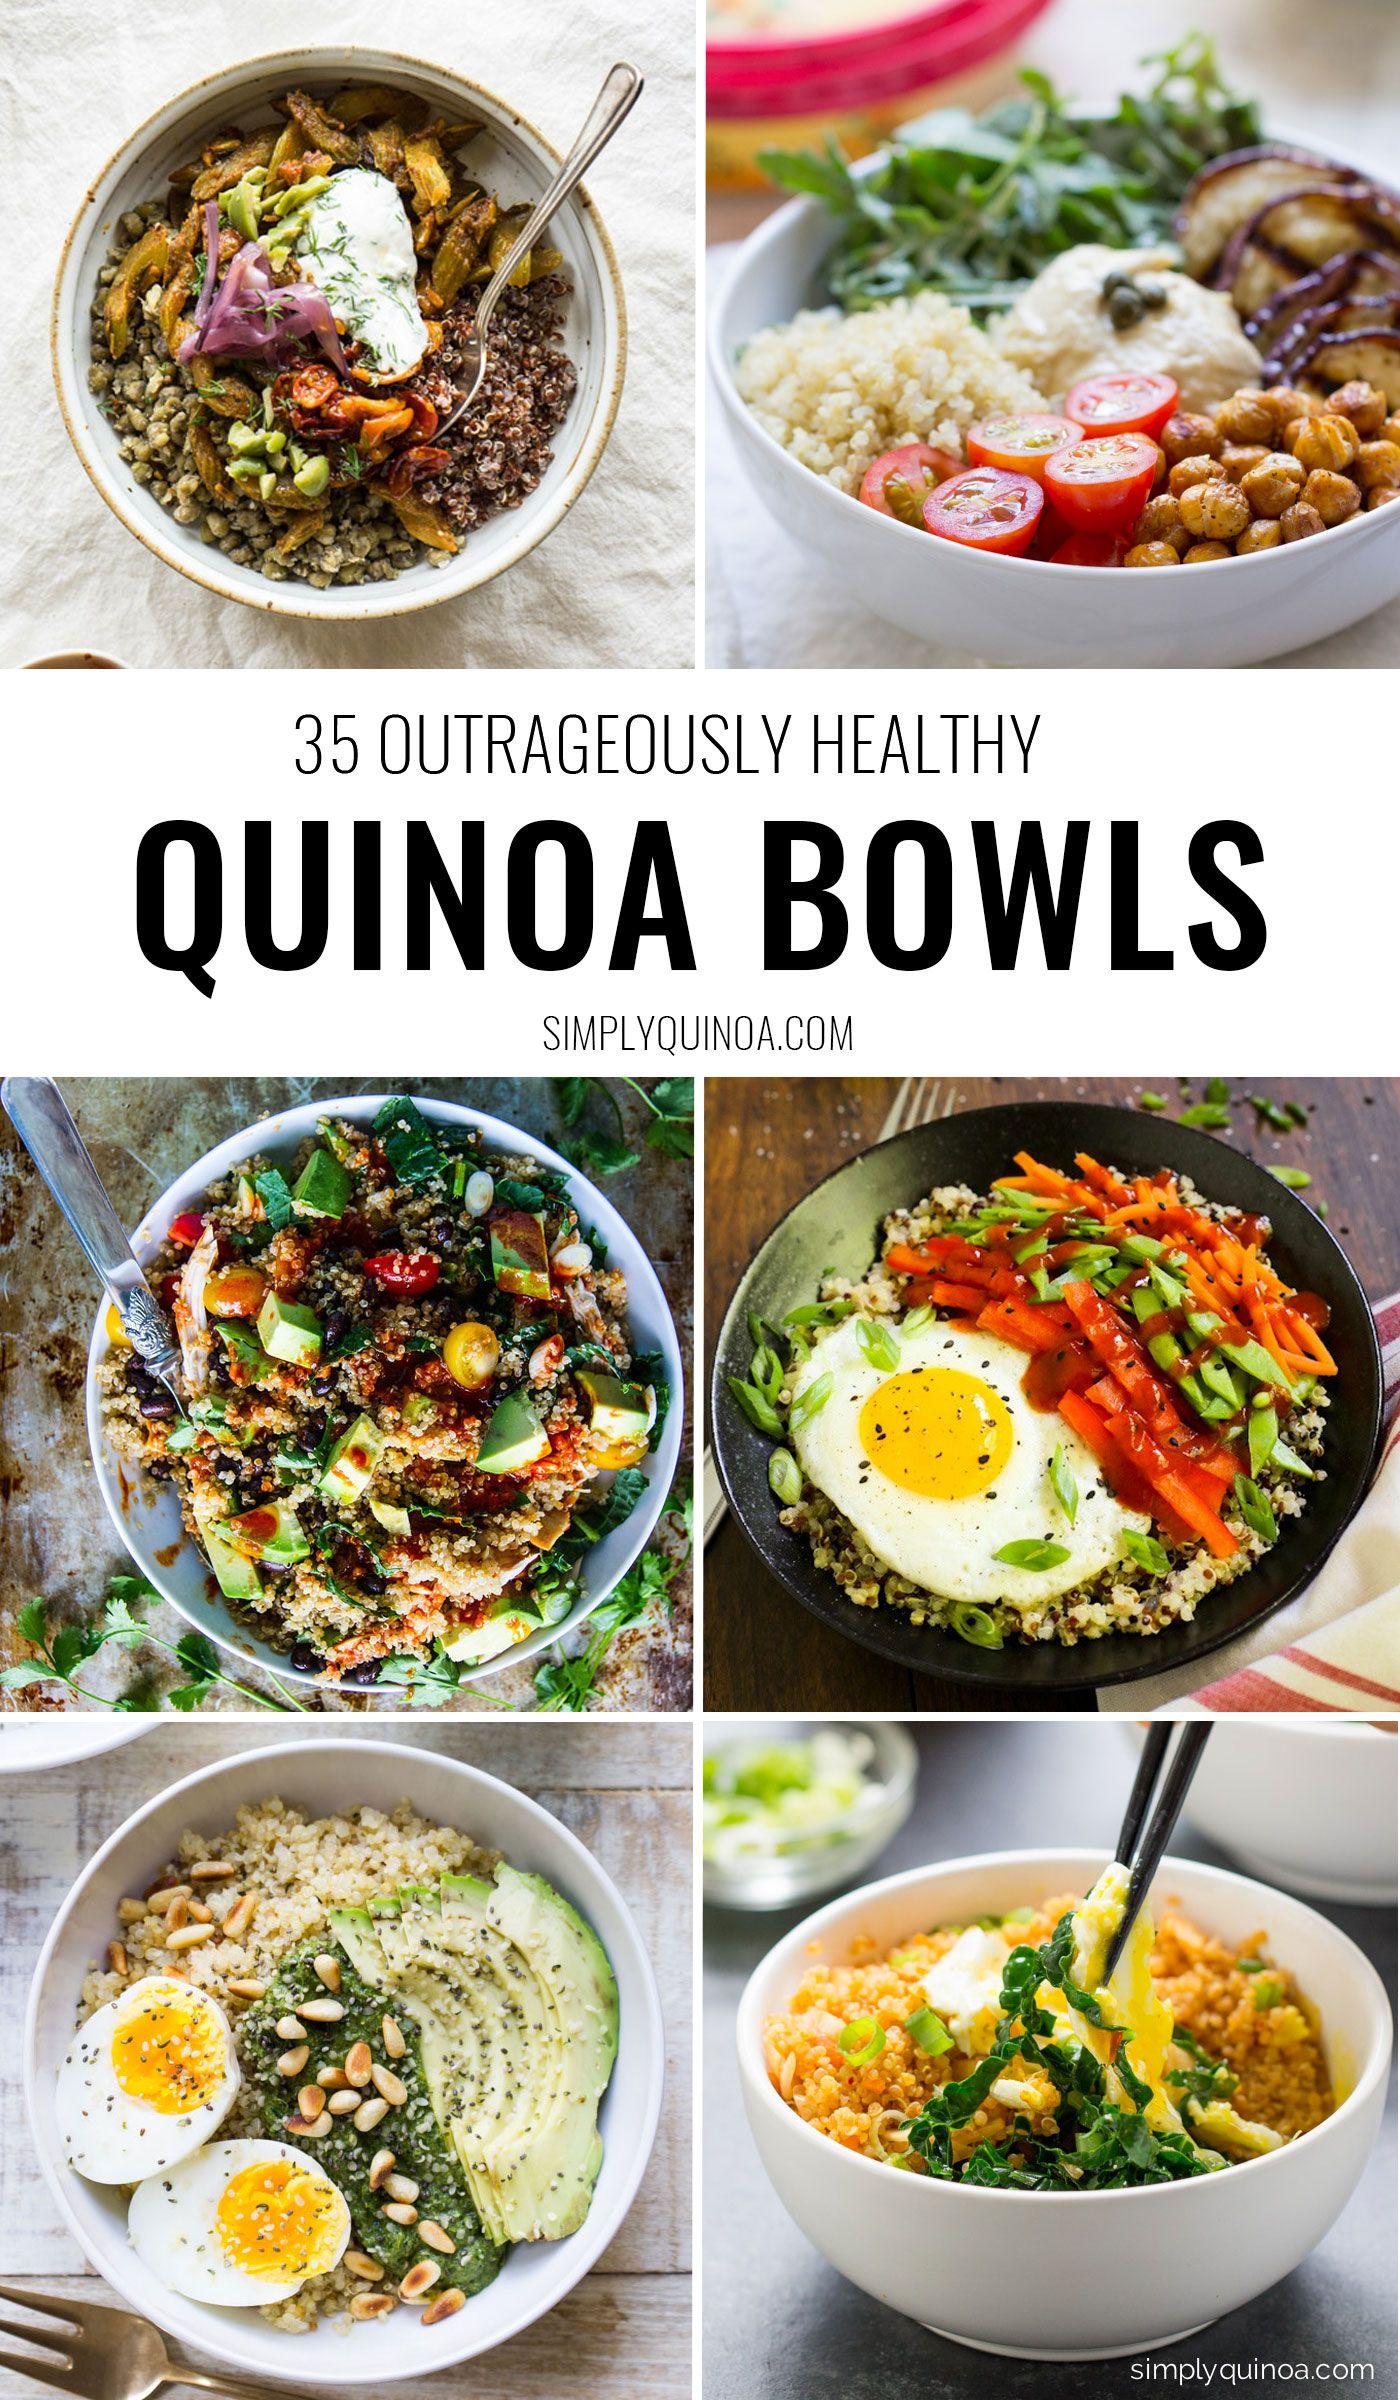 The 35 Best Quinoa Bowls Simply Quinoa Healthy Bowls Quinoa Healthy Healthy Eating